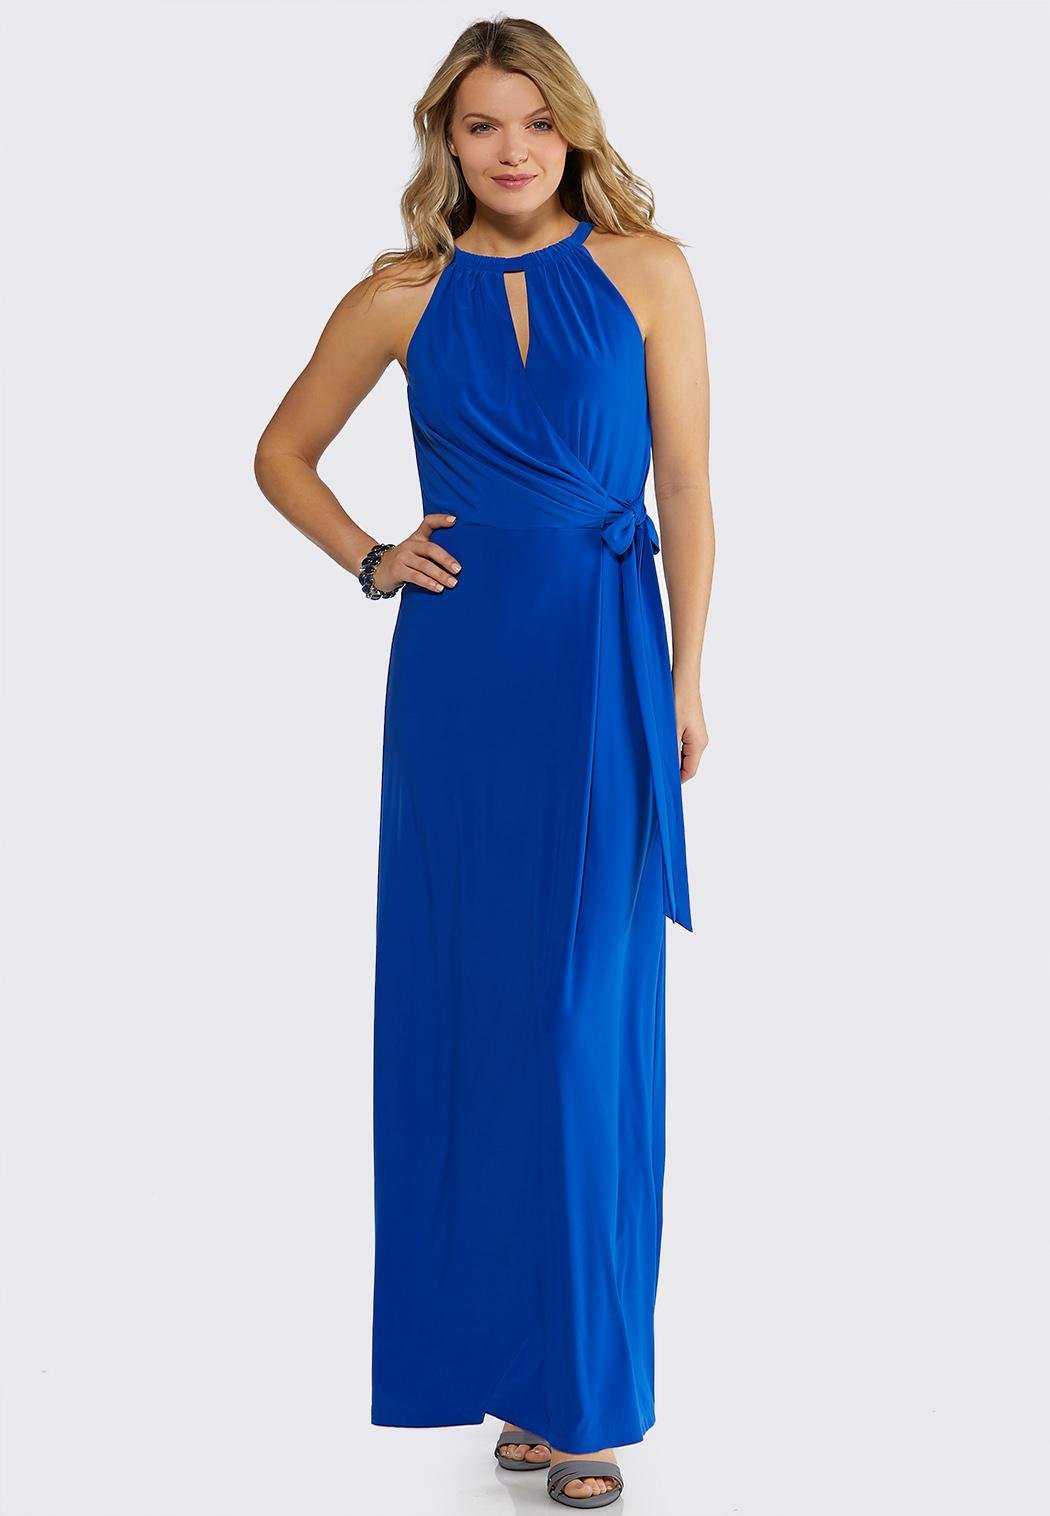 8bcbdbf47cd Faux Wrap Solid Maxi Dress Junior Misses Cato Fashions